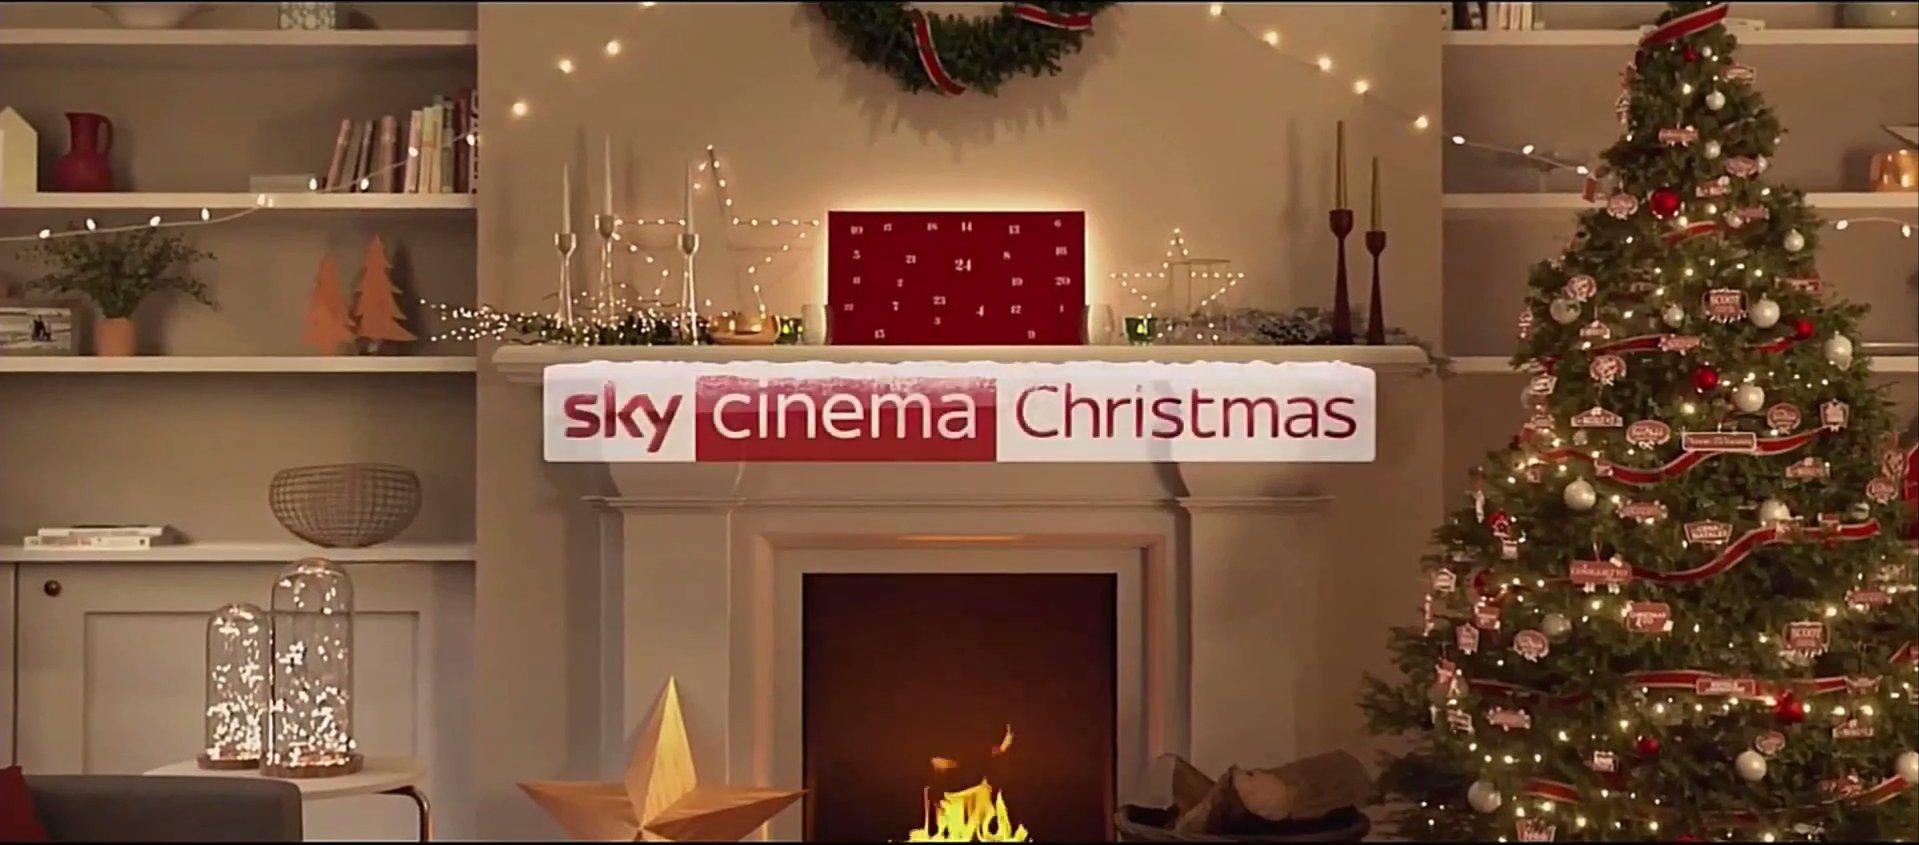 Novità DTT, Sky Cinema Christmas (dal 24/12 al 2/1) sul canale 472